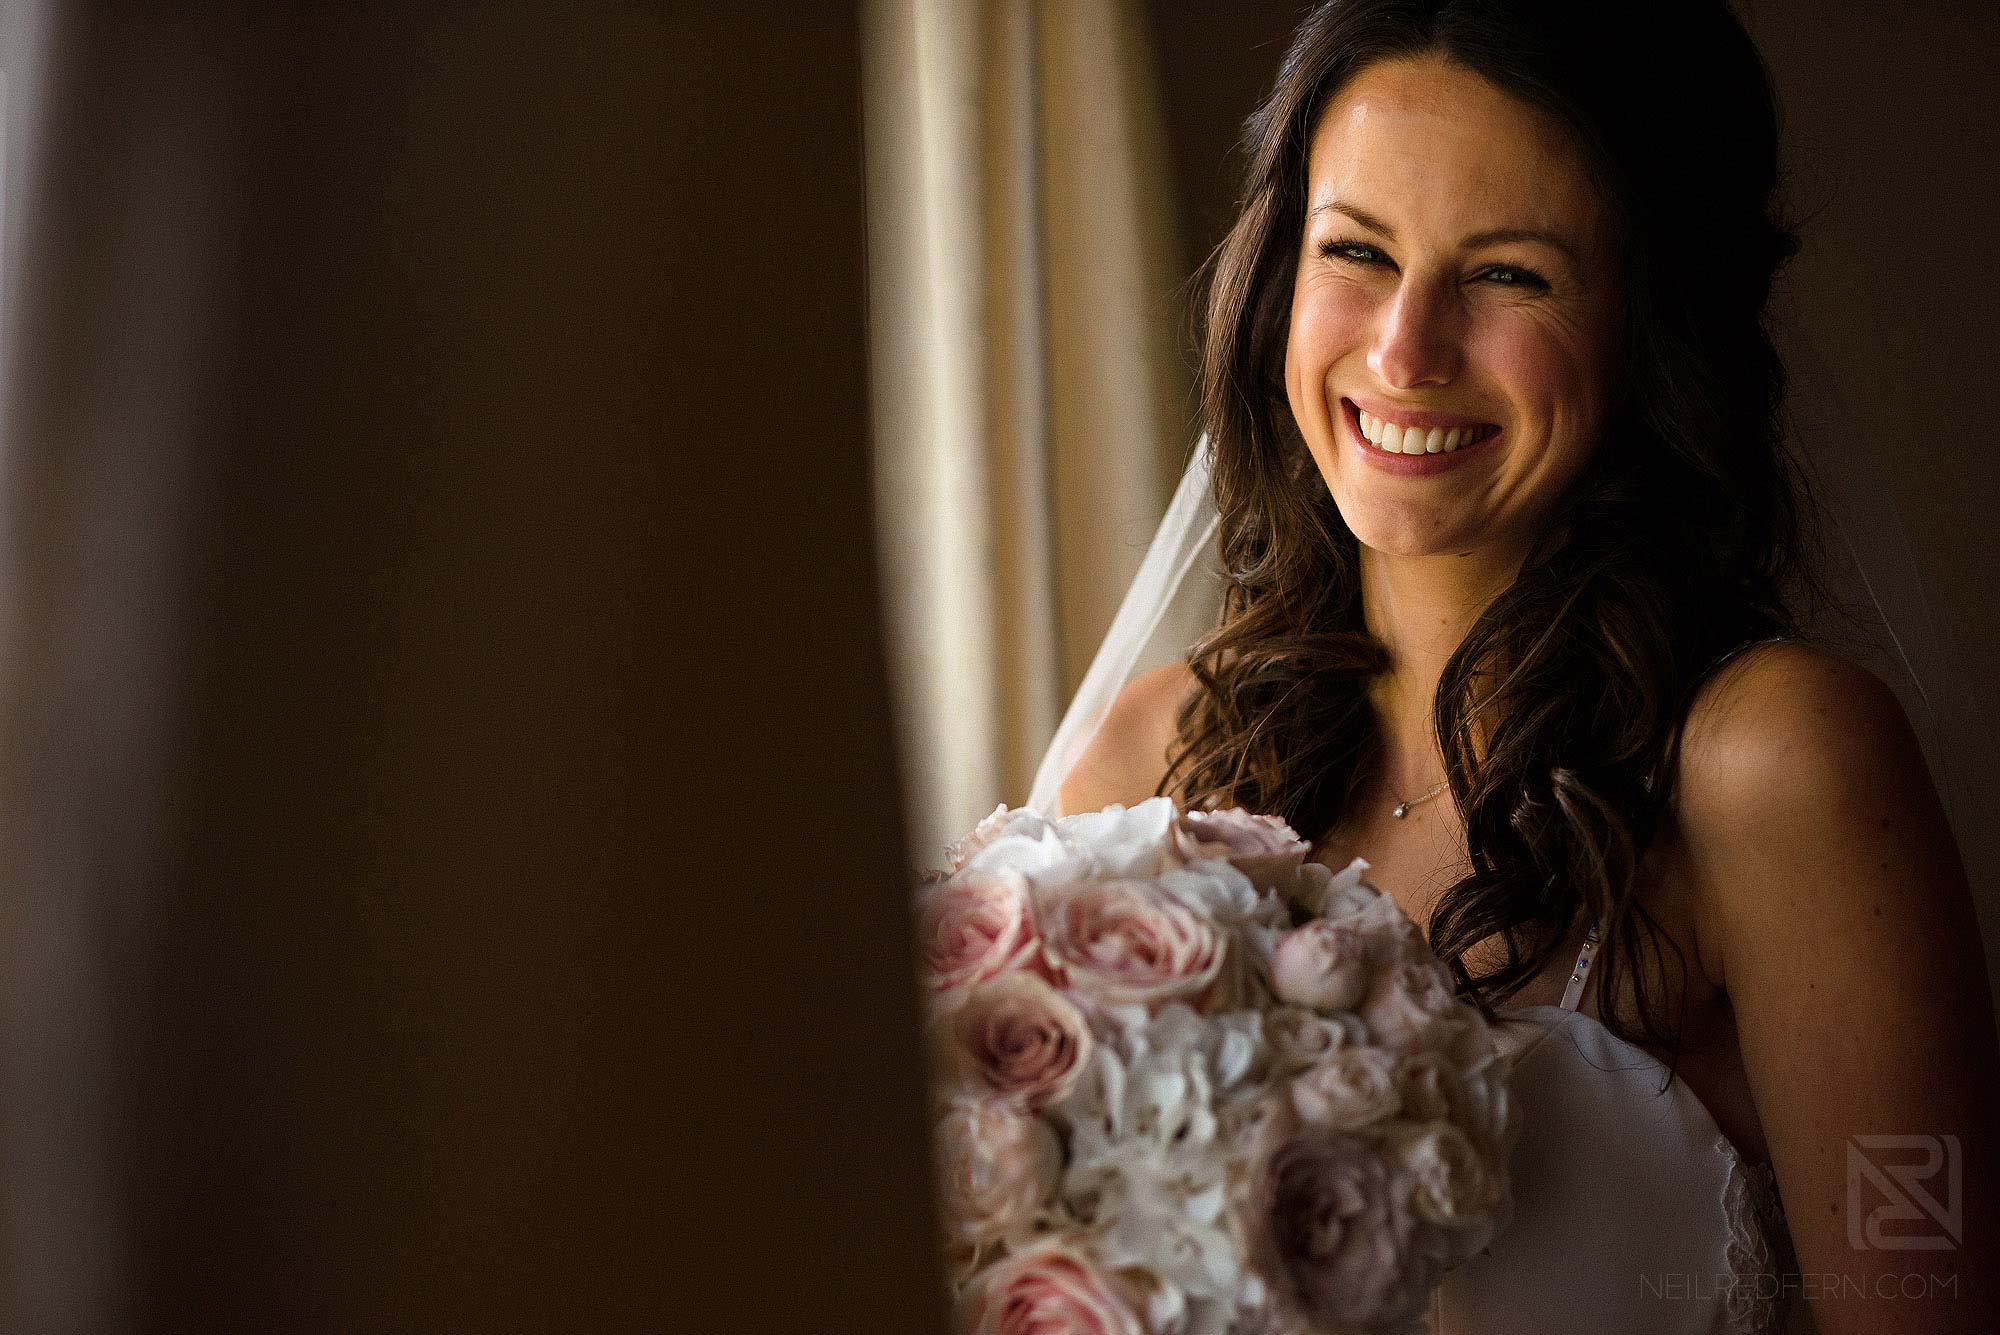 beautiful portrait of happy bride